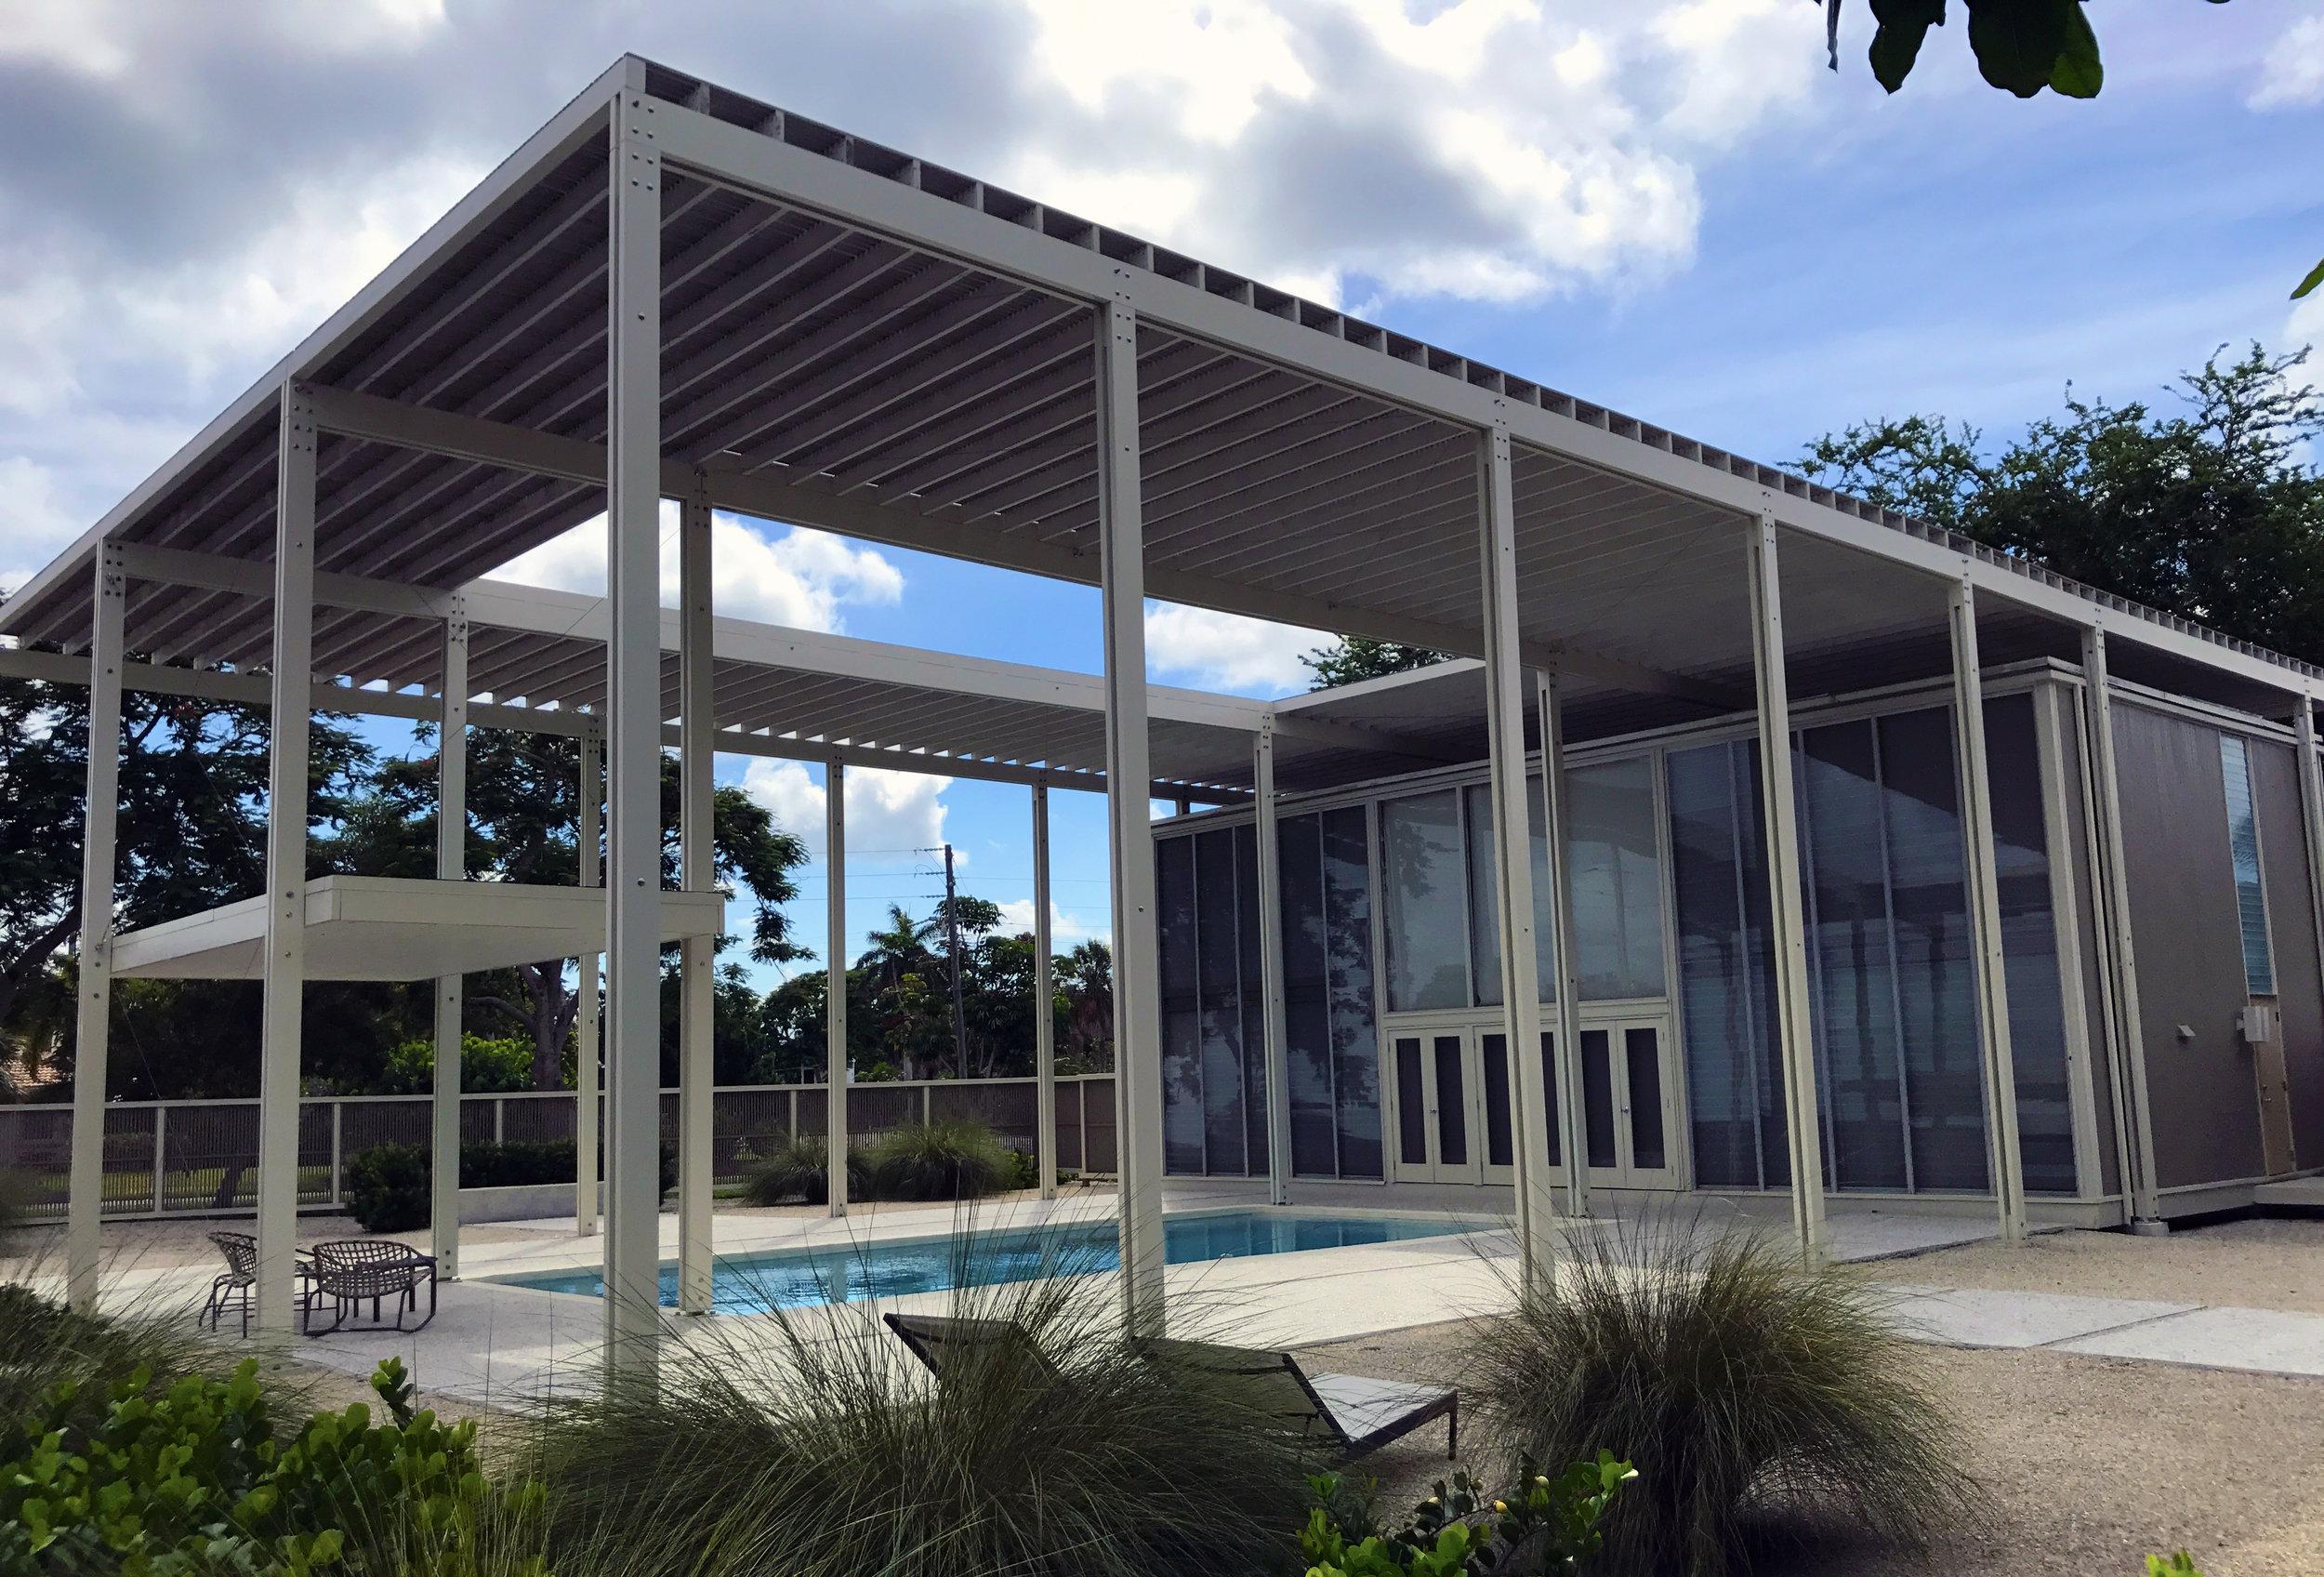 Paul Rudolph's Umbrella residence in 2018. Photo: Kelvin Dickinson, Paul Rudolph Heritage Foundation Archives